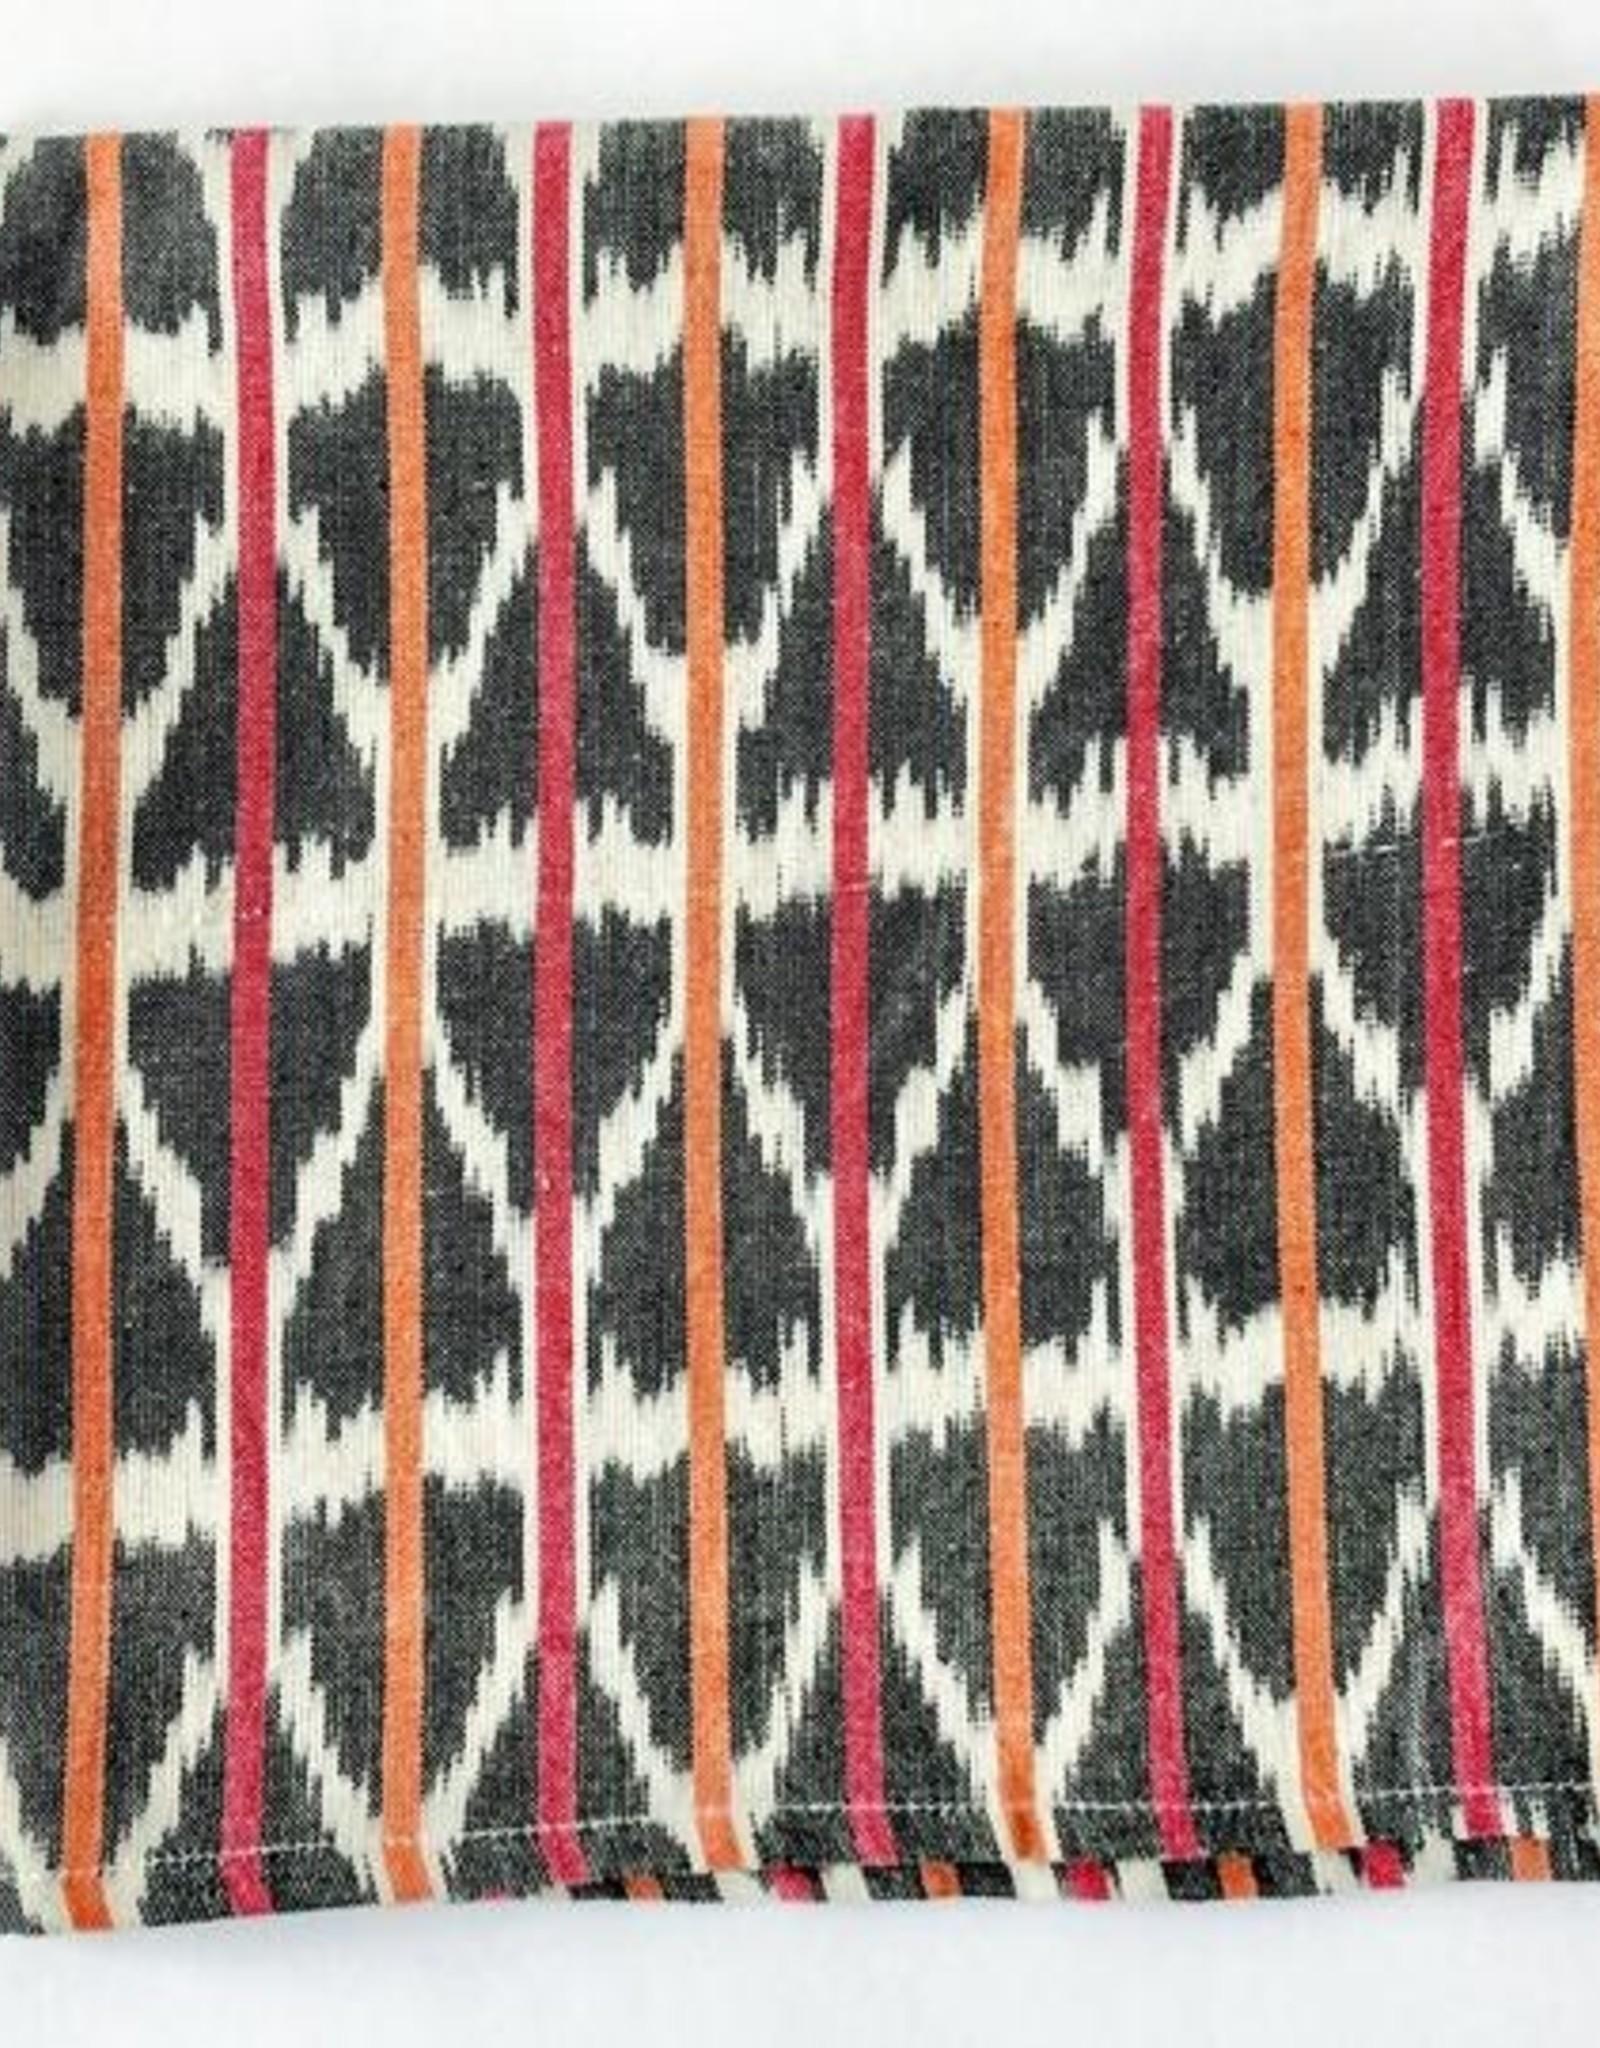 Rustic loom Orange & Pink Stripe Cotton Ikat Cloth Napkins